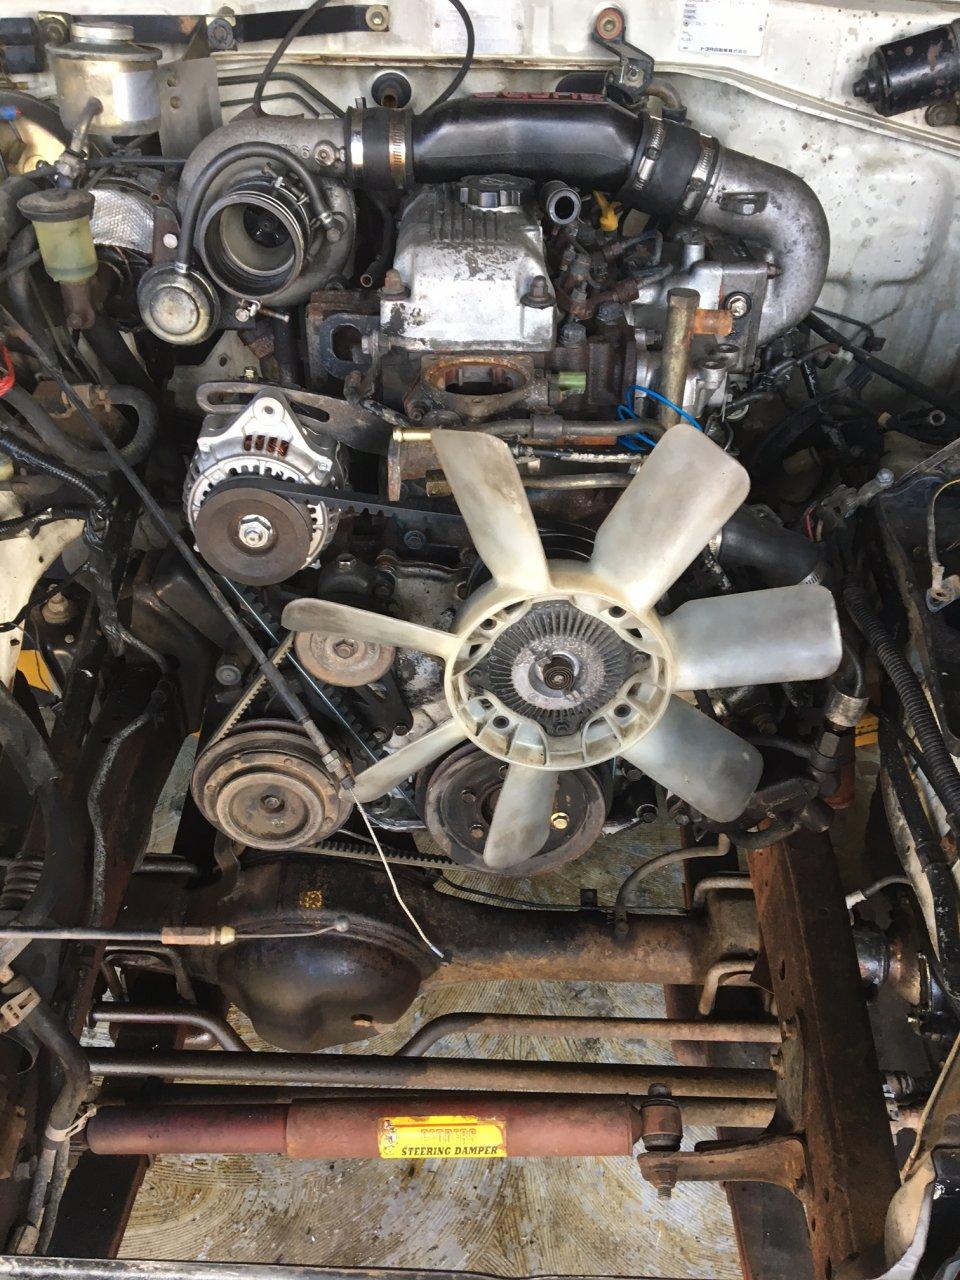 BJ73 engine upgrade to 14BT   Page 2   IH8MUD Forum